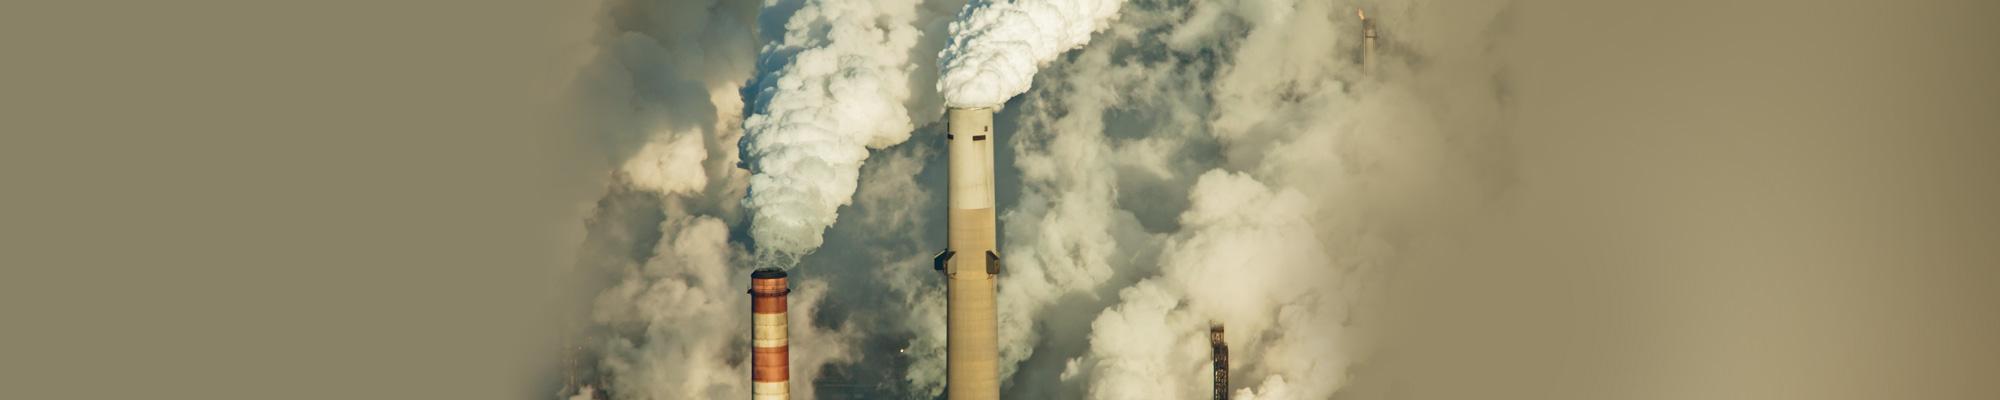 faire-rente_SLIDES_smoke